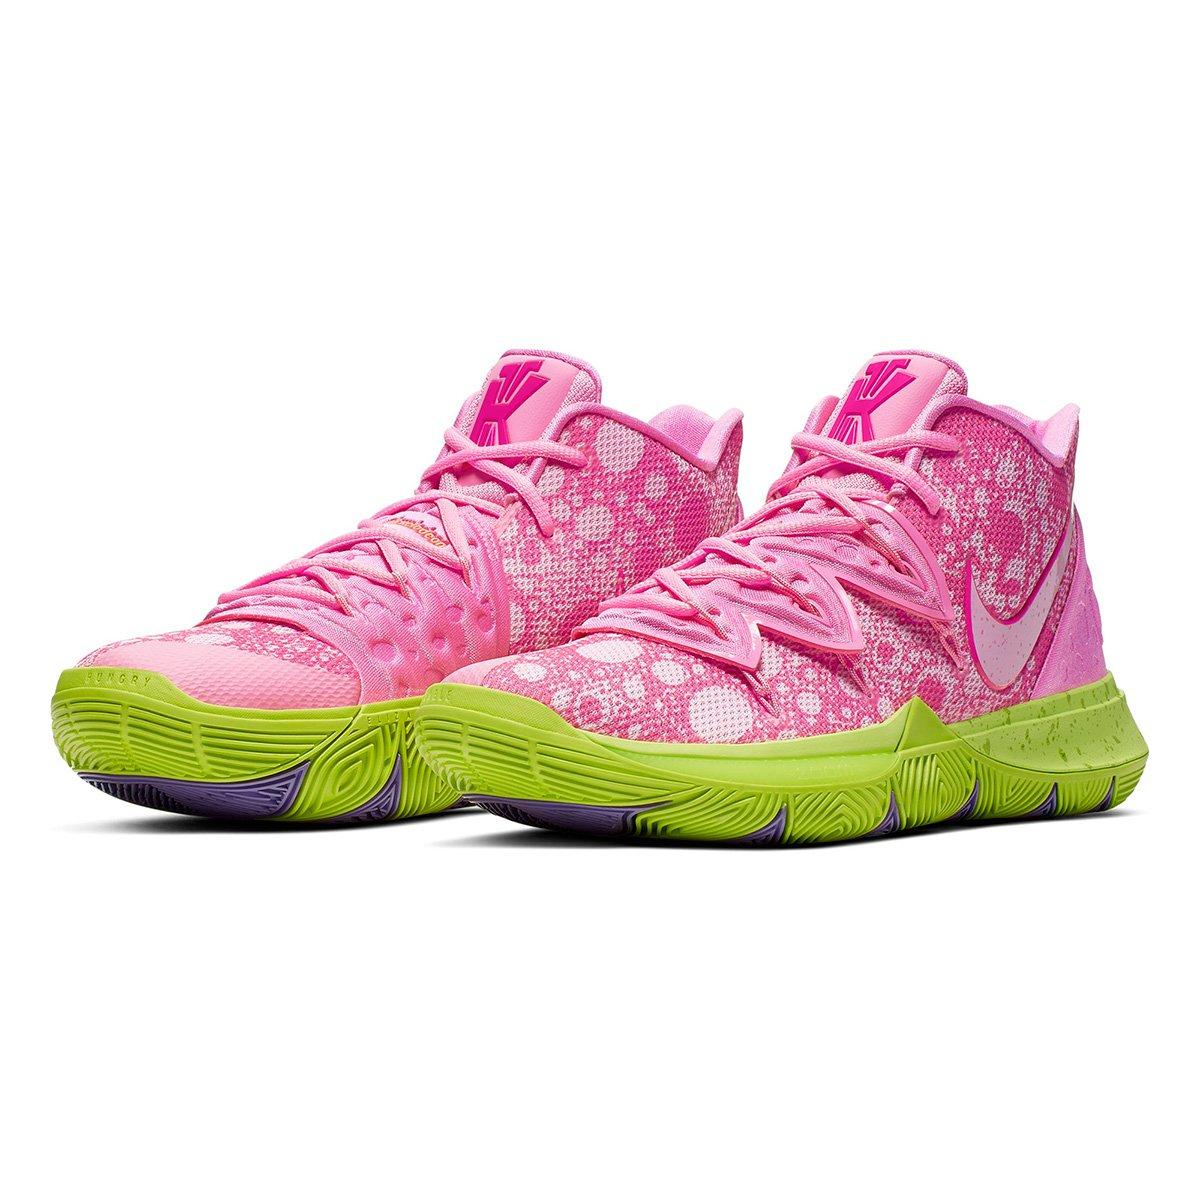 Tênis Nike Kyrie 5 SpongeBob SquarePants Masculino | Loja NBA